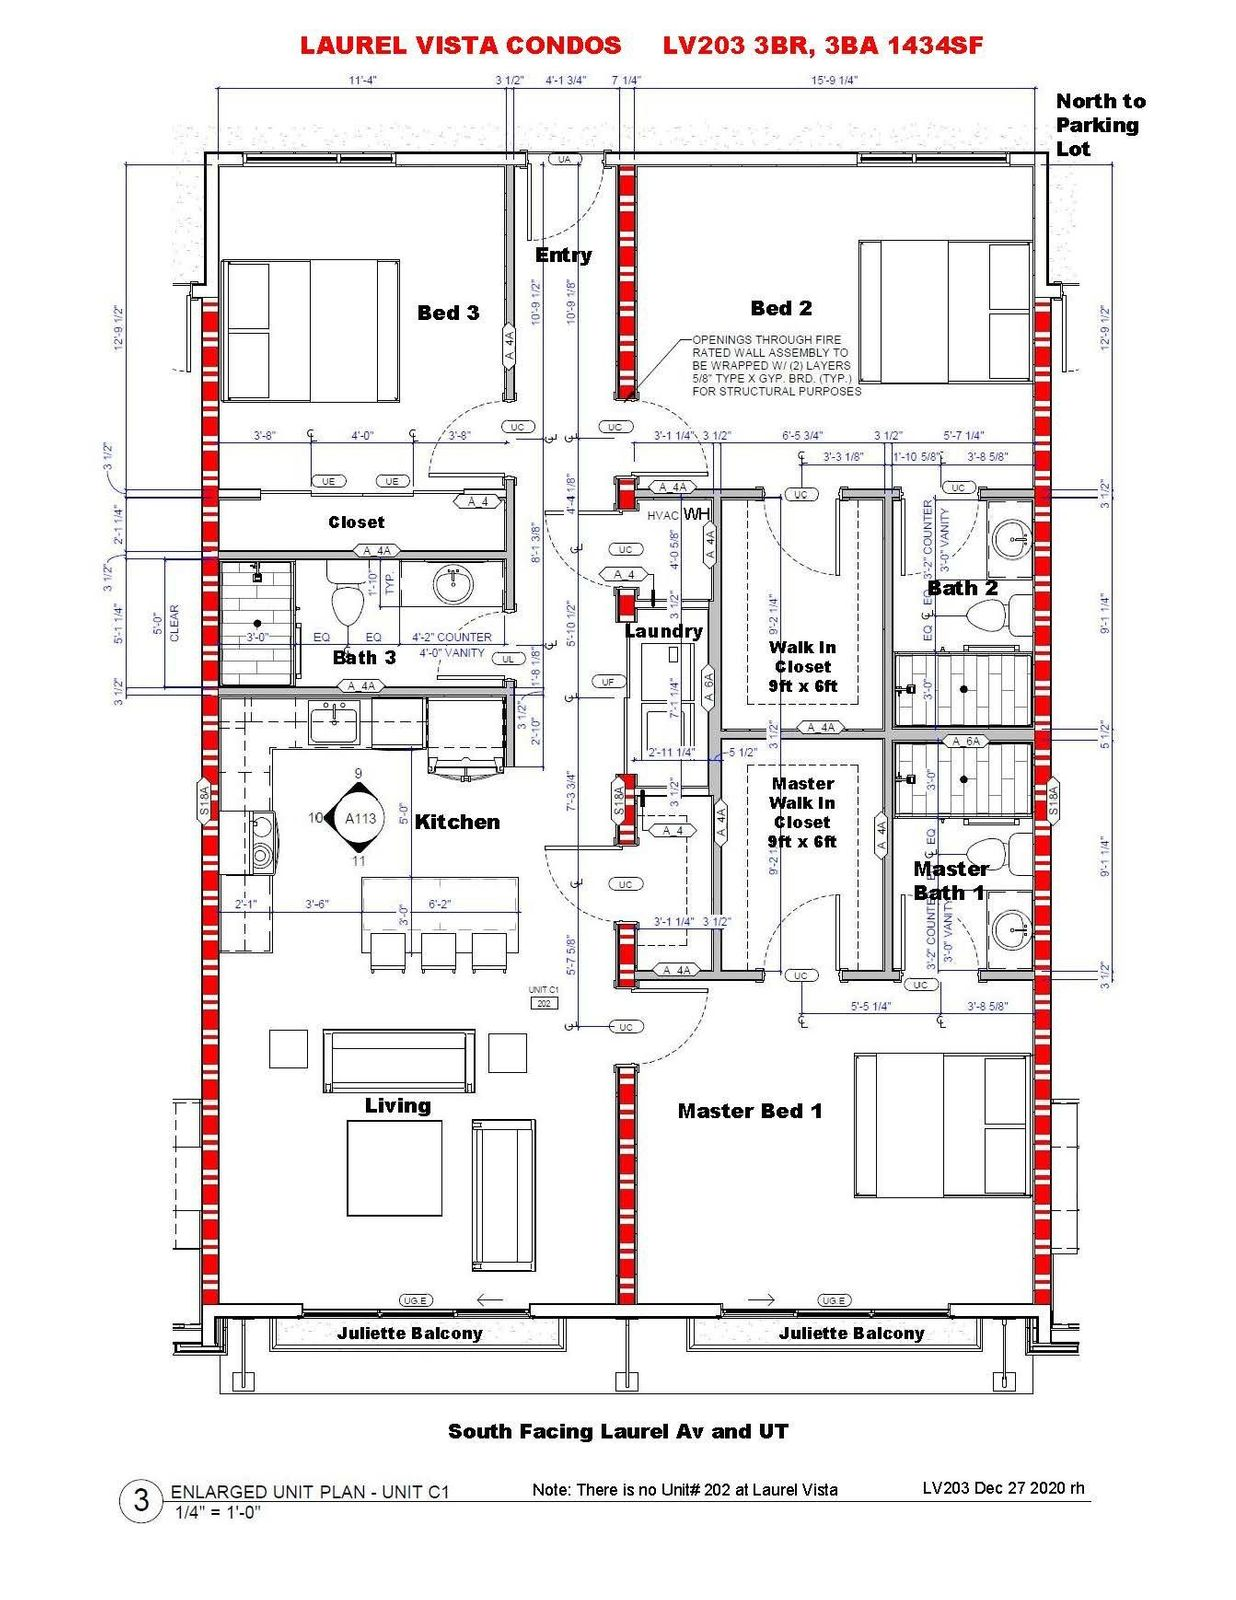 LV203 3BR,3BA - Floorplan 1434SF